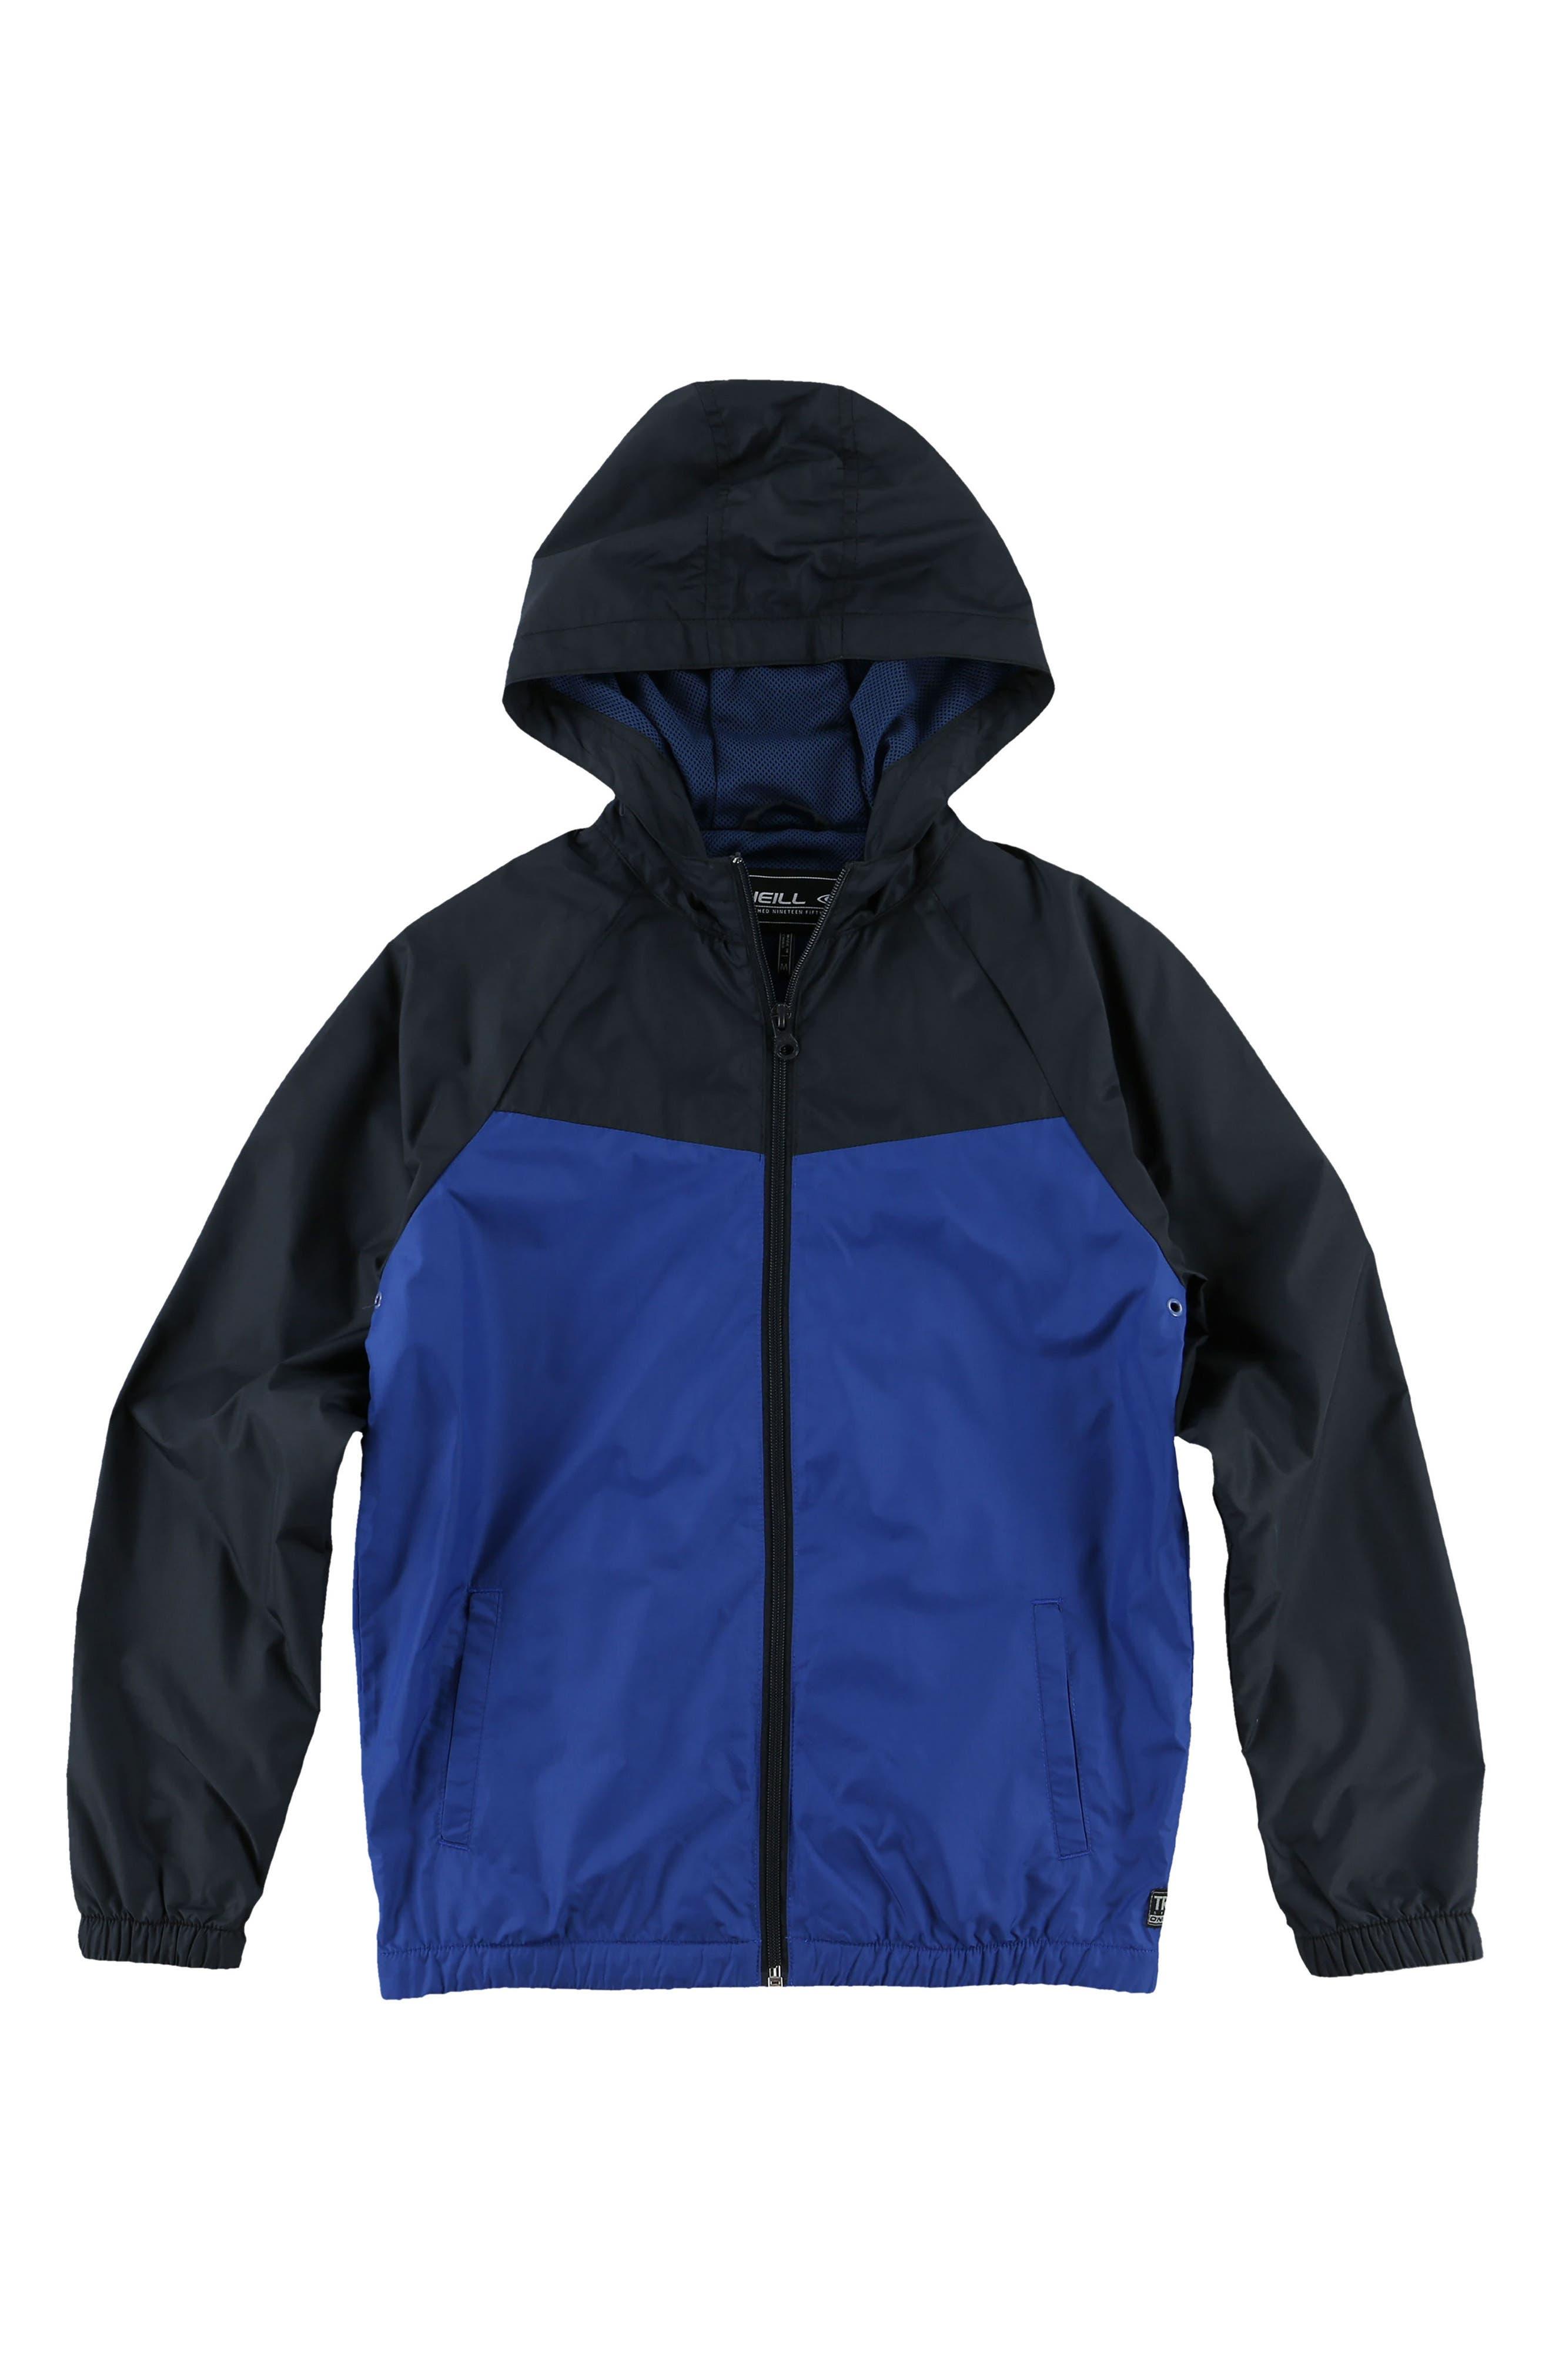 Main Image - O'Neill Traveler Packable Windbreaker Jacket (Big Boys)